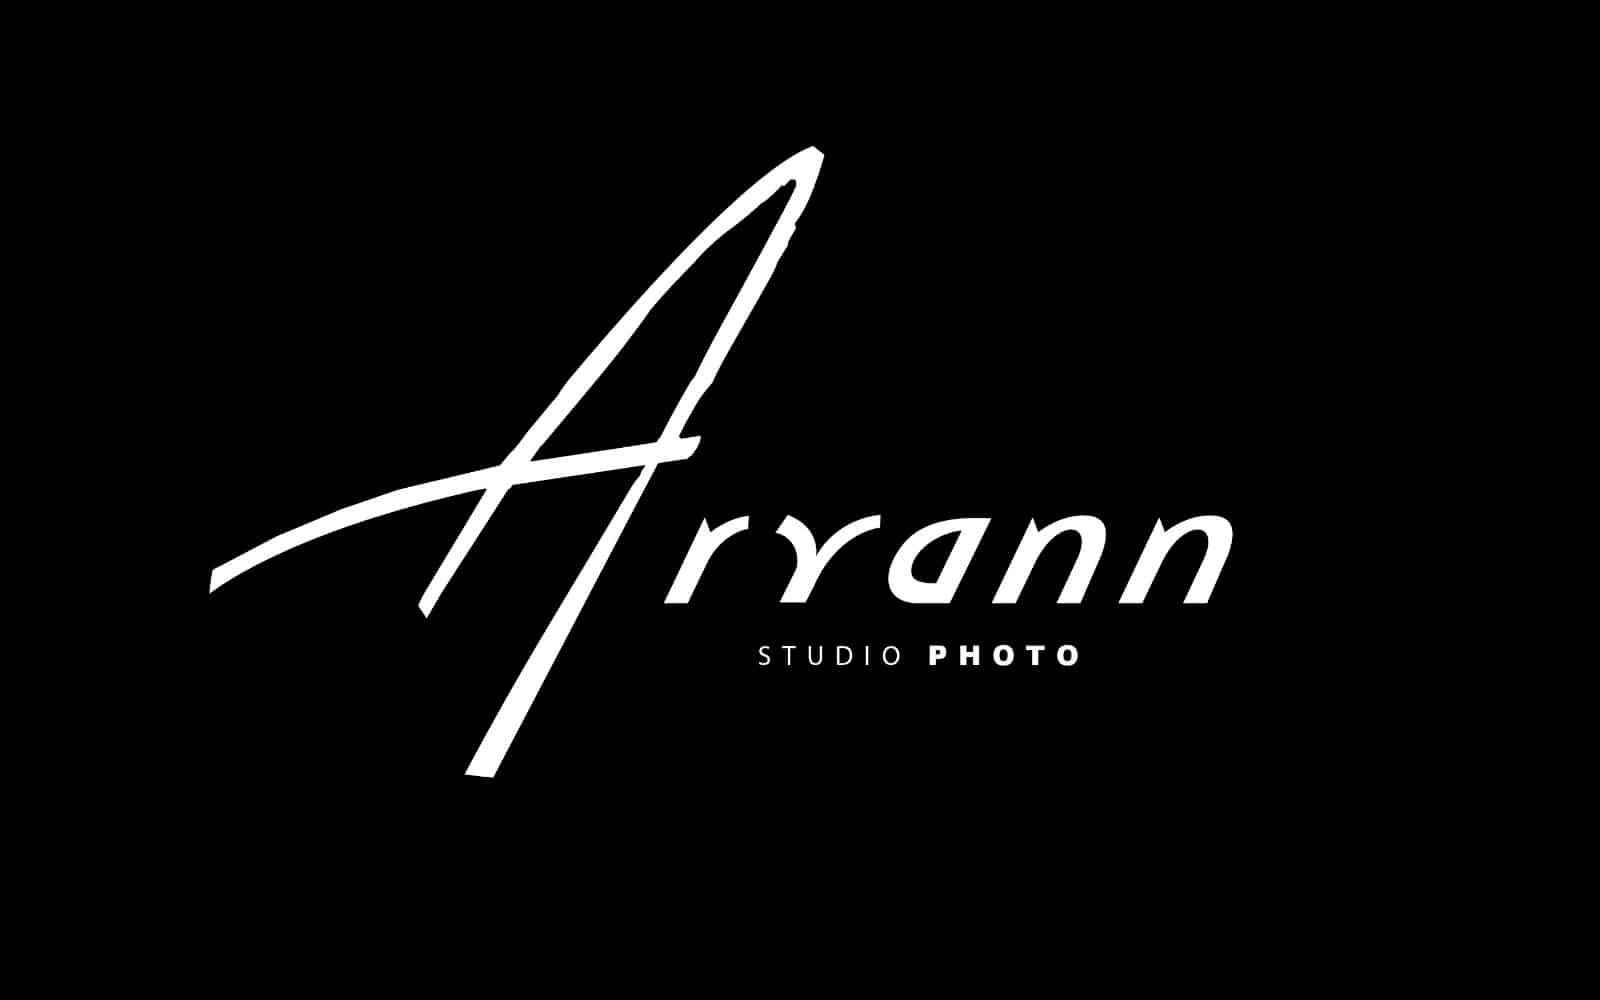 logo aryann photographie